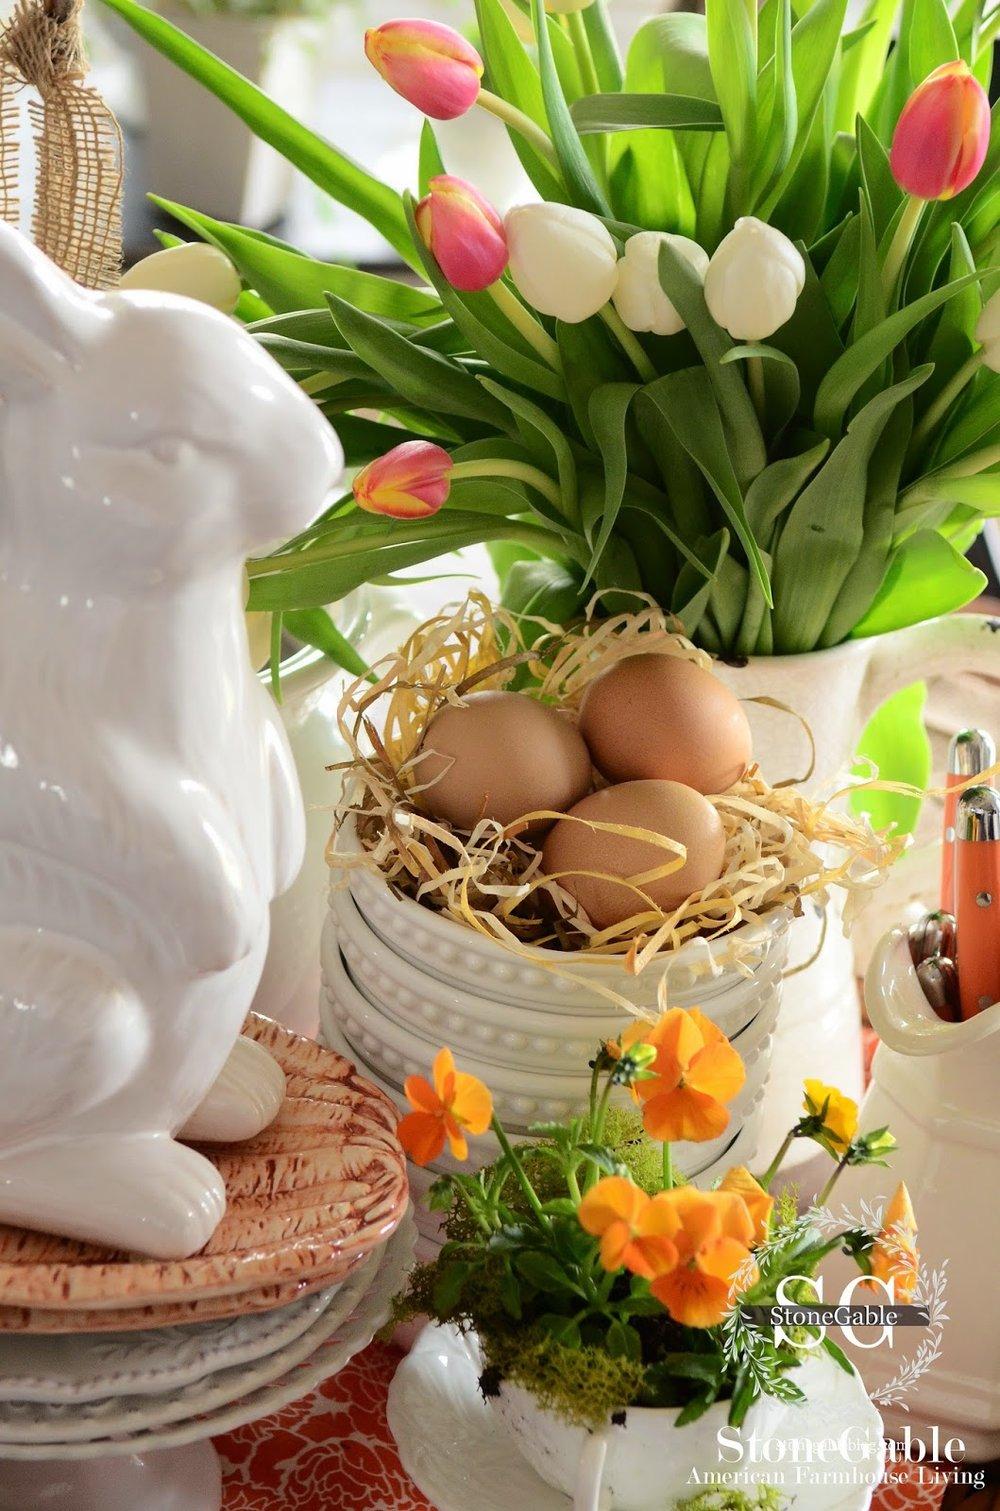 Spring-Kitchen-Vignette-bunny-stonegableblog